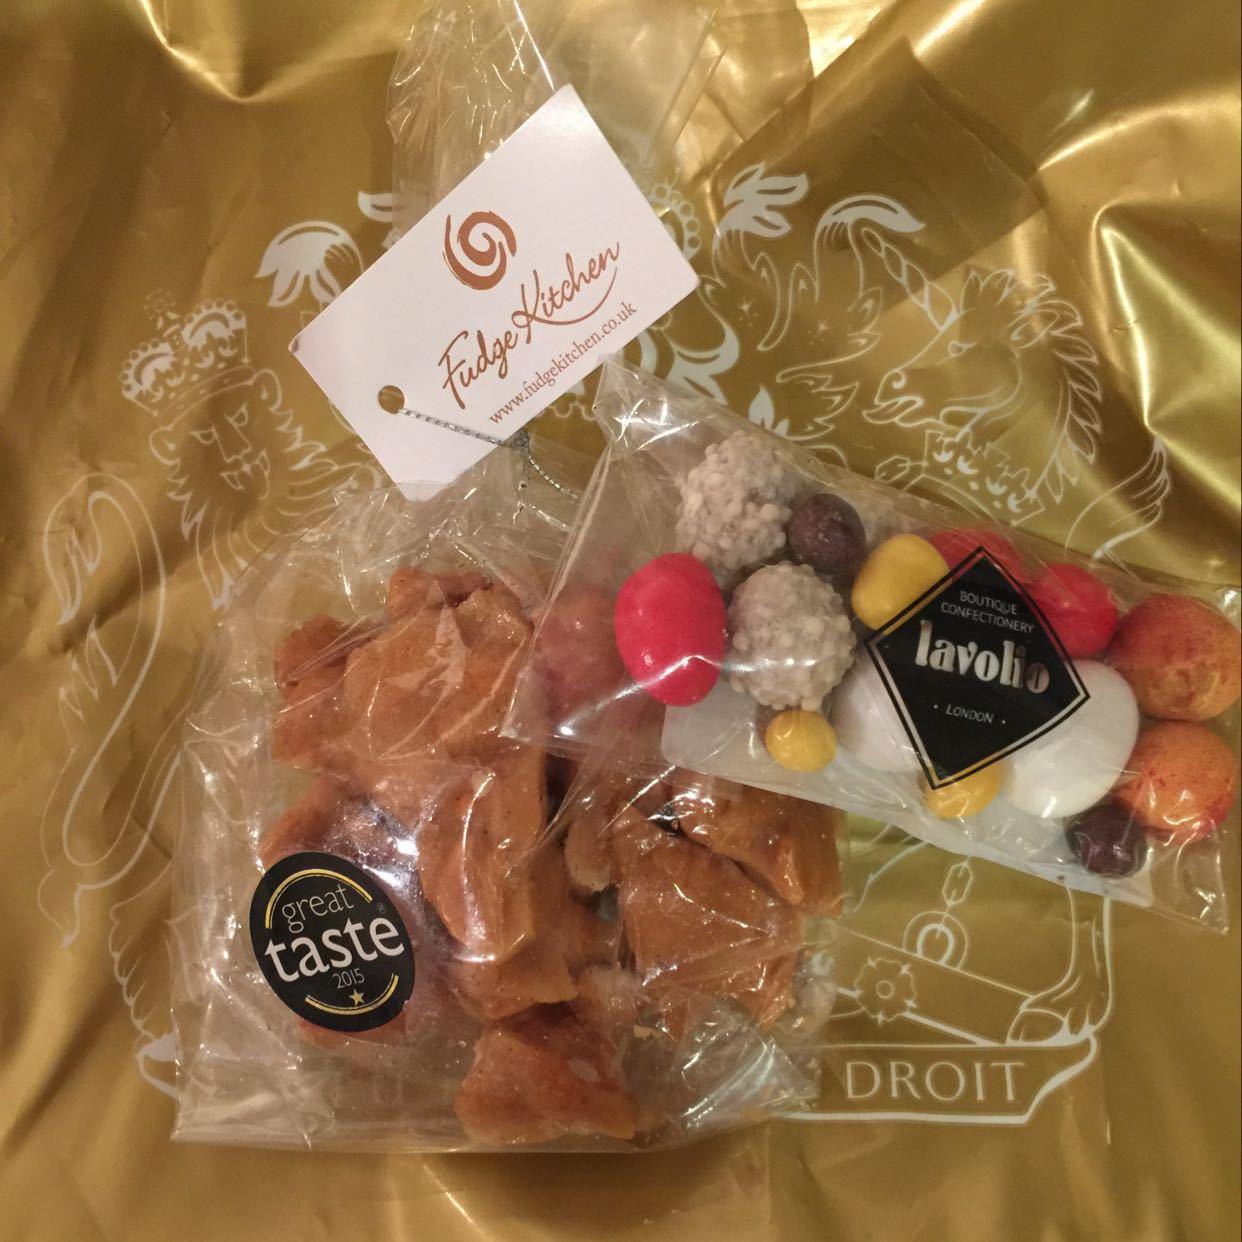 Peanut Brittle & mini Decadent Spiced snack bag